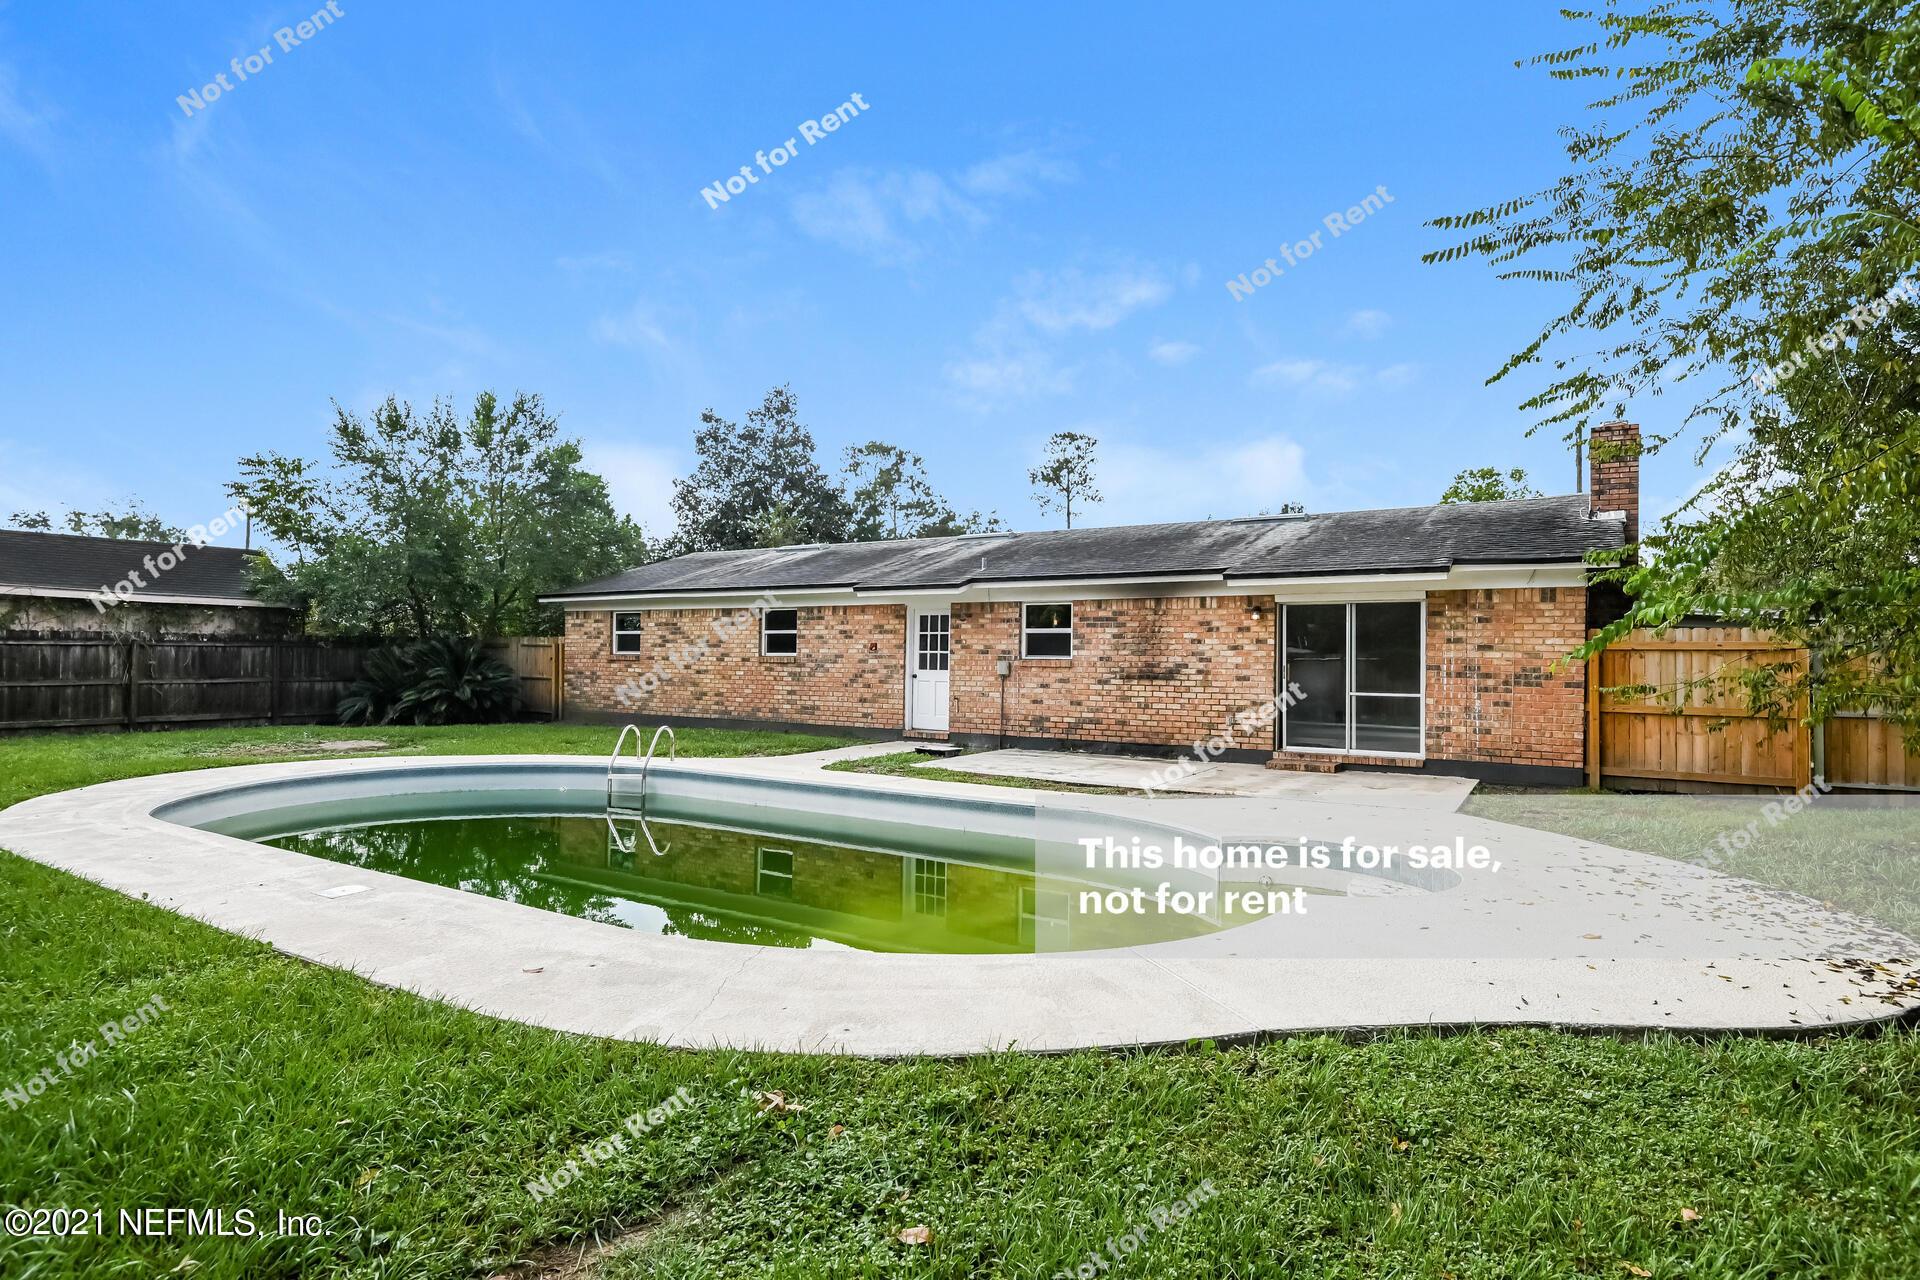 1127 WILLOW, ORANGE PARK, FLORIDA 32073, 3 Bedrooms Bedrooms, ,2 BathroomsBathrooms,Residential,For sale,WILLOW,1135928